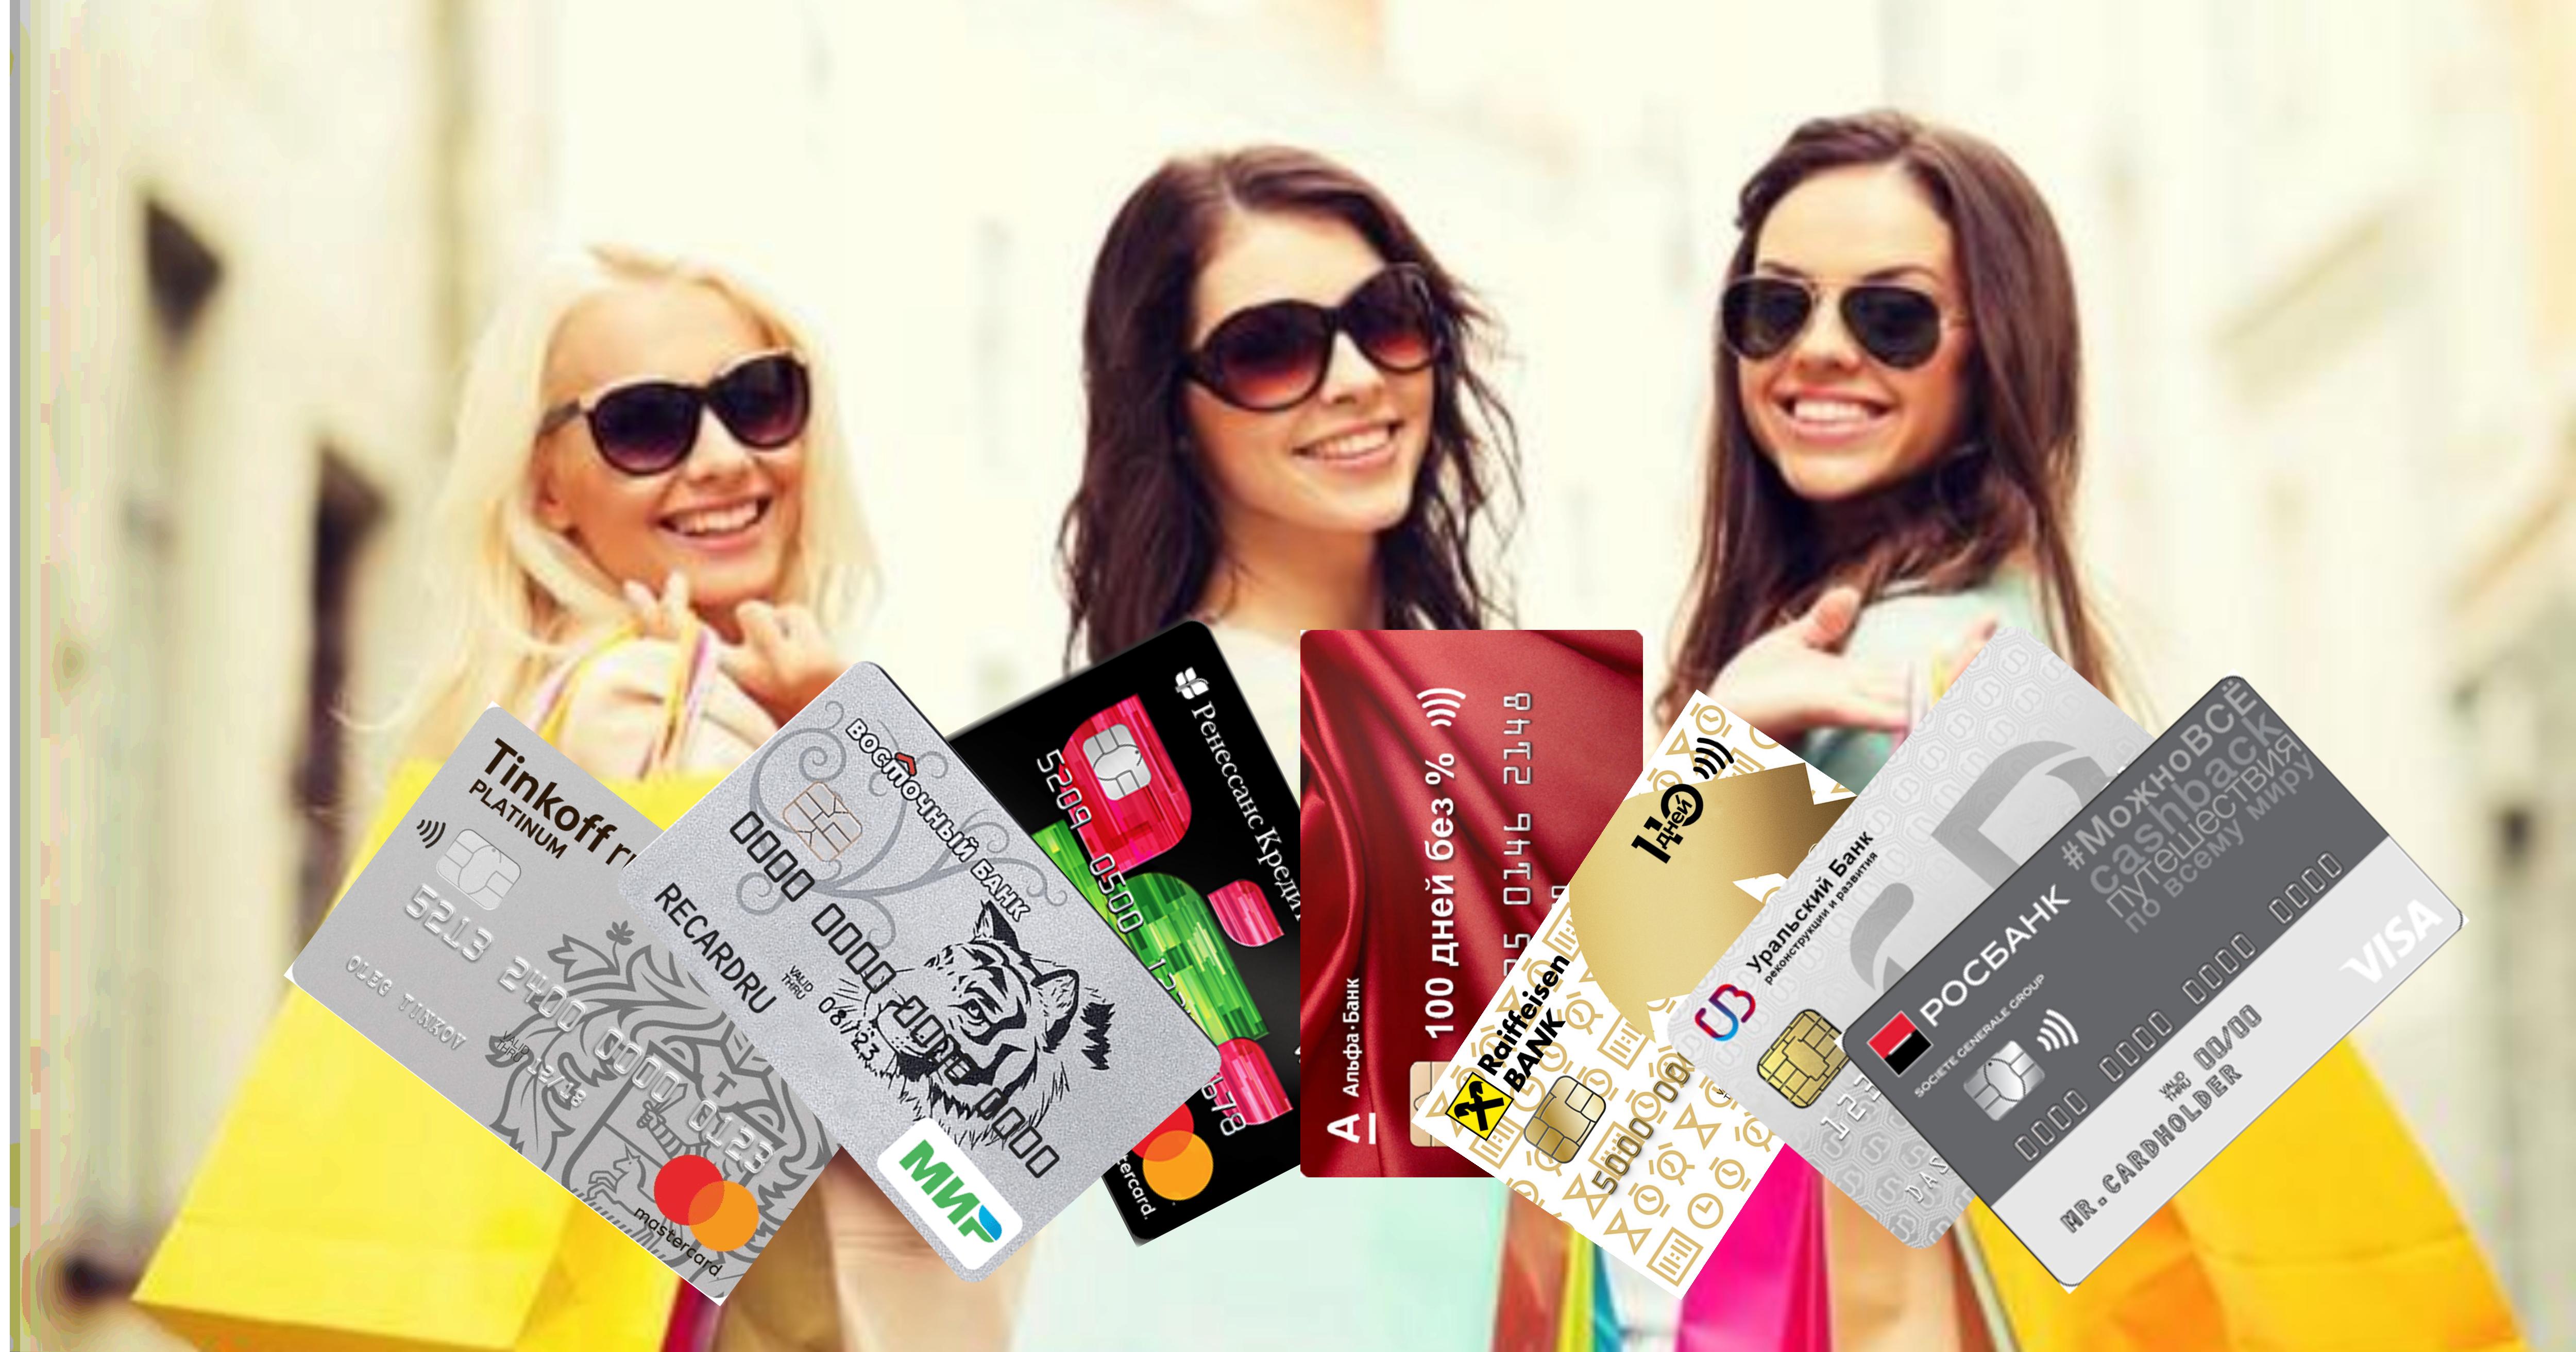 моментальная кредитная карта райффайзенбанк